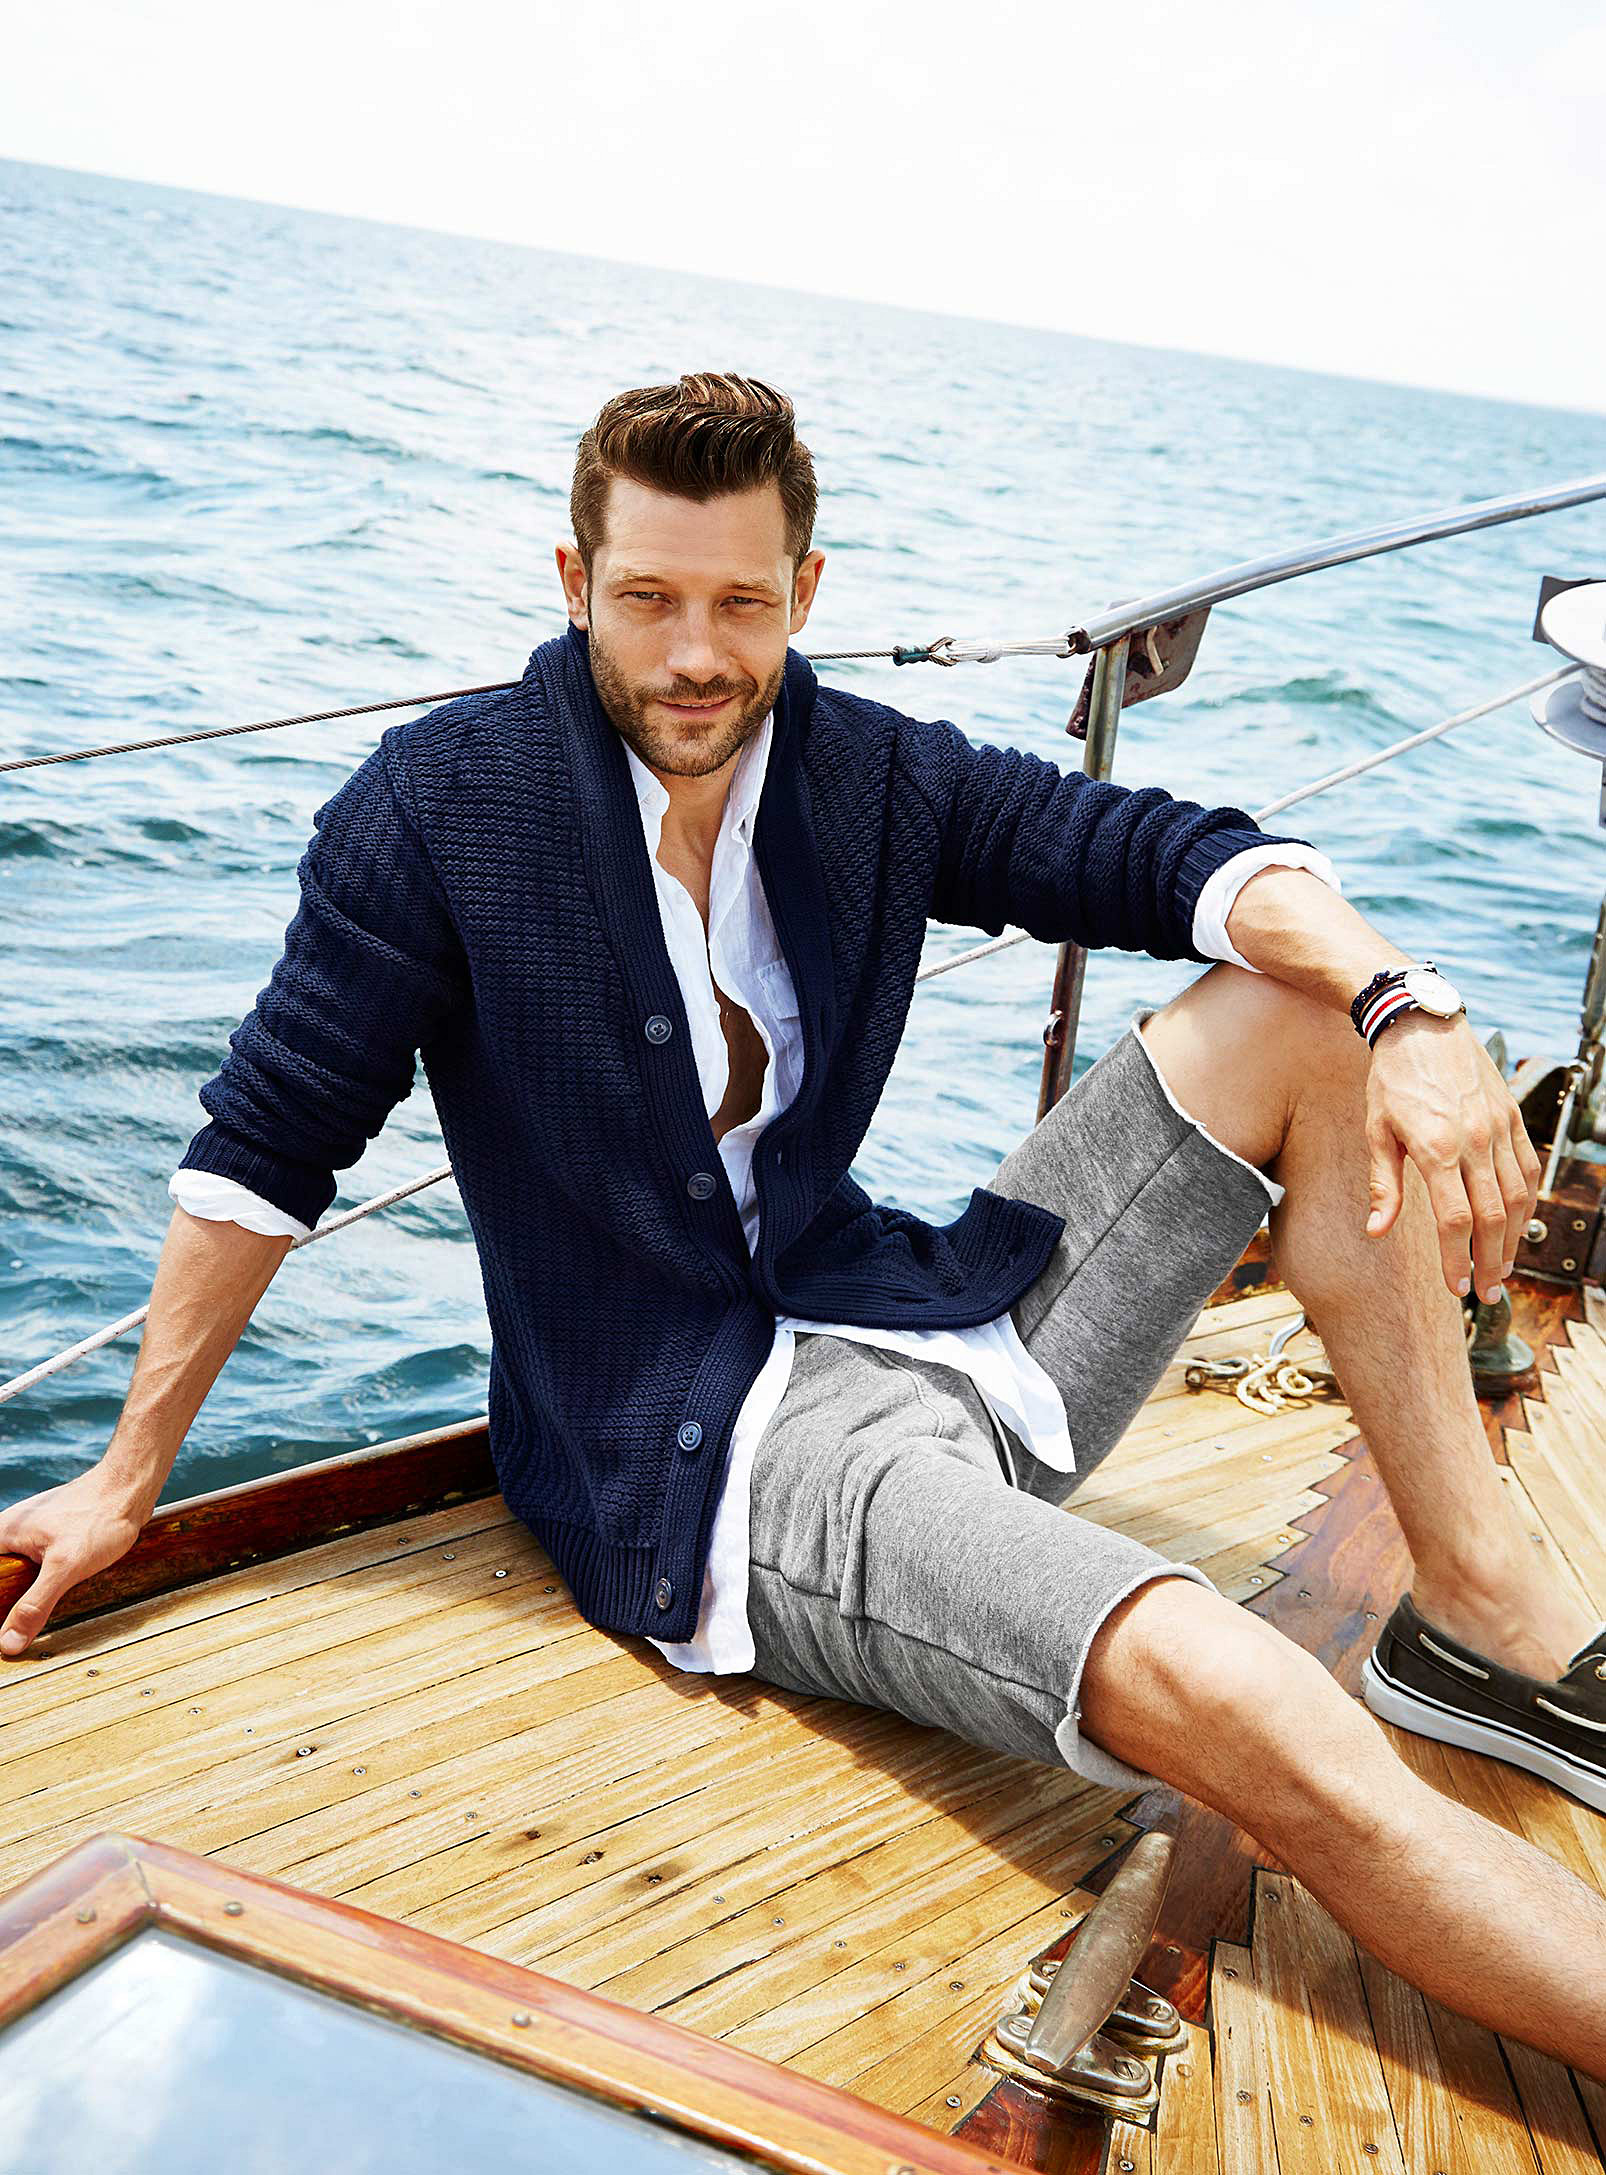 John Halls Models Nautical Styles for Simons Summer 2014 Lookbook